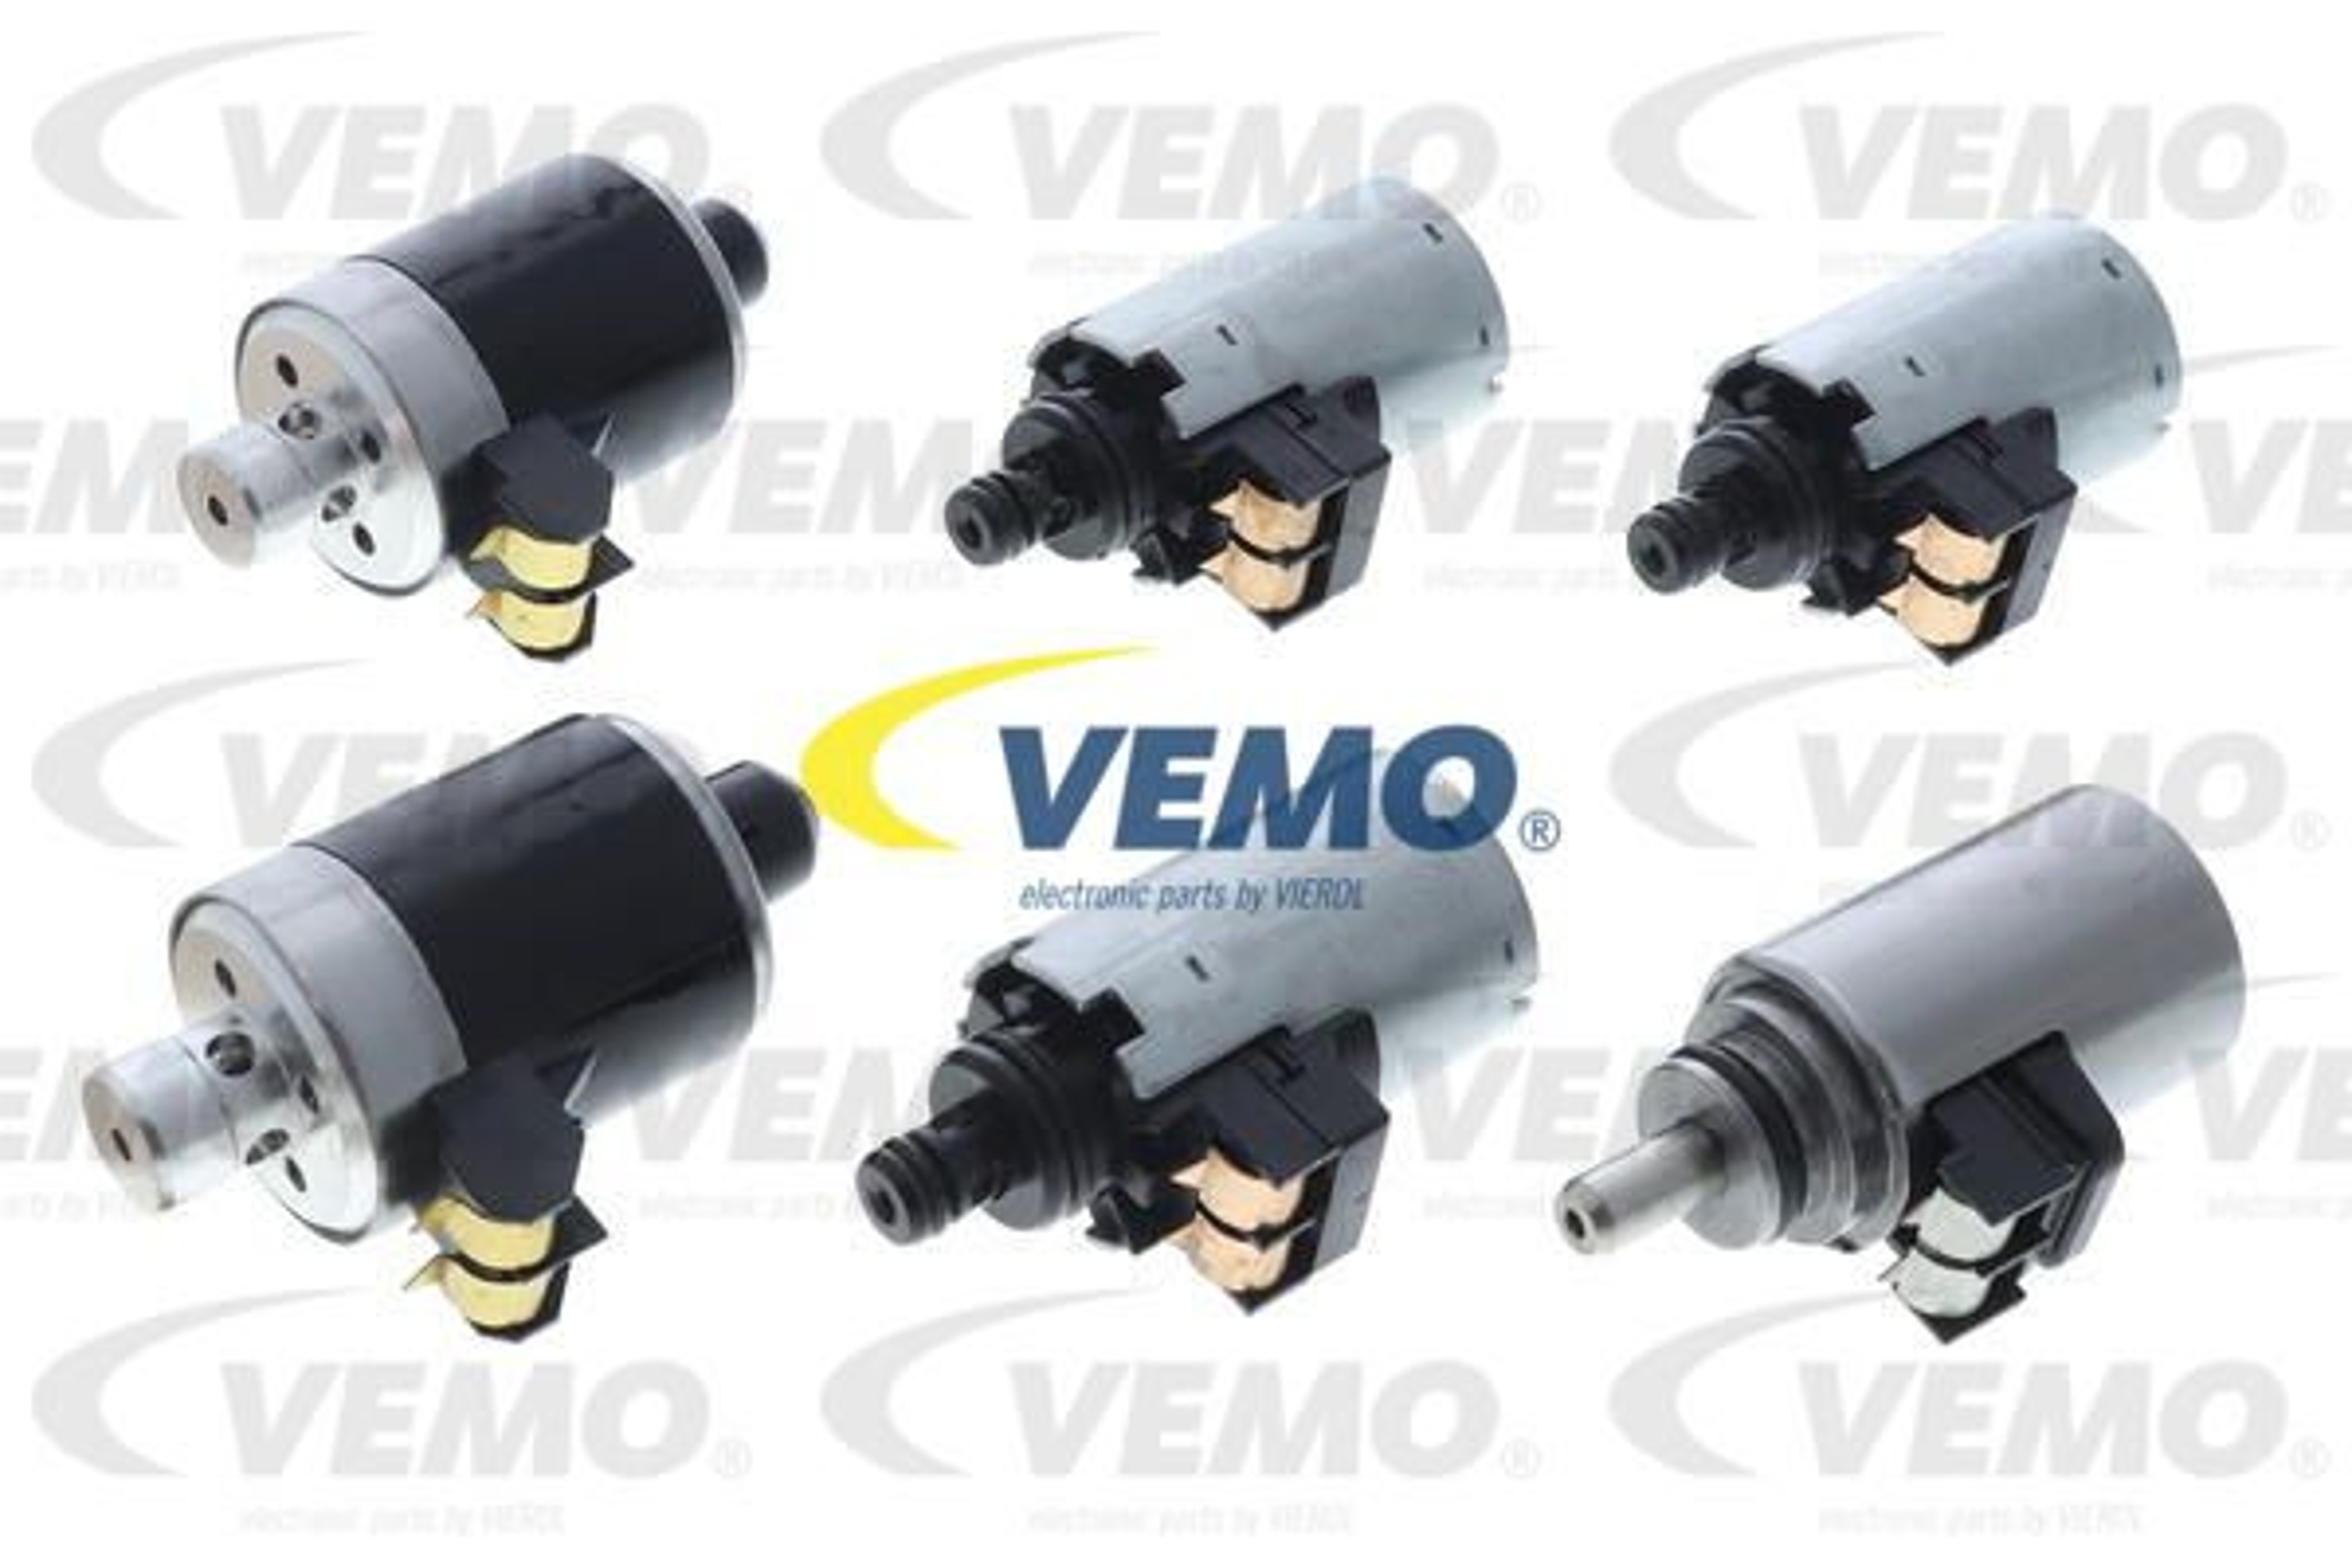 MERCEDES-BENZ C-Klasse 2019 Schaltventil, Automatikgetriebe - Original VEMO V30-77-0042